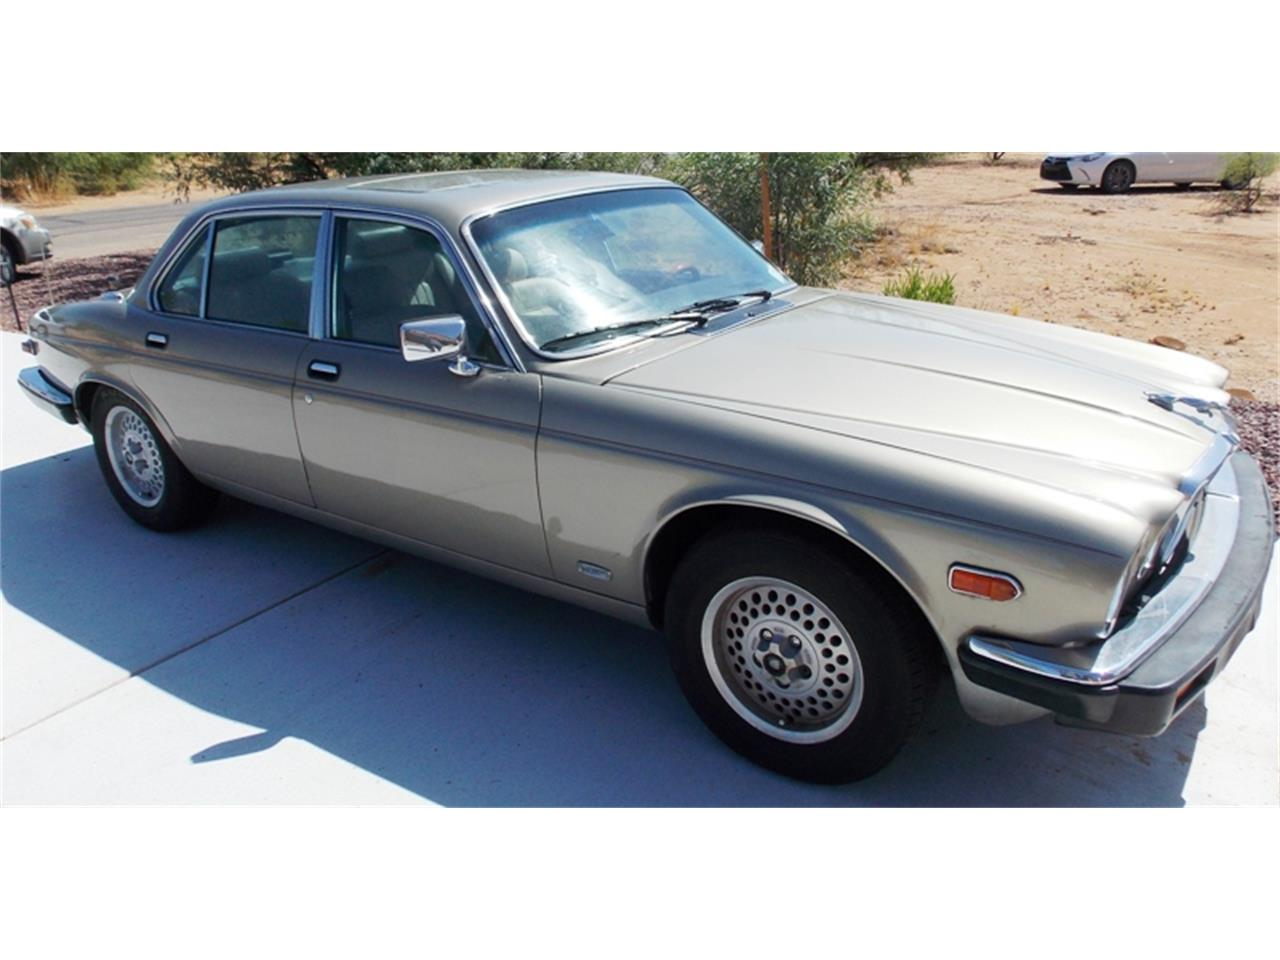 Large Picture of 1986 Jaguar XJ6 located in AZ - Arizona - QNNV